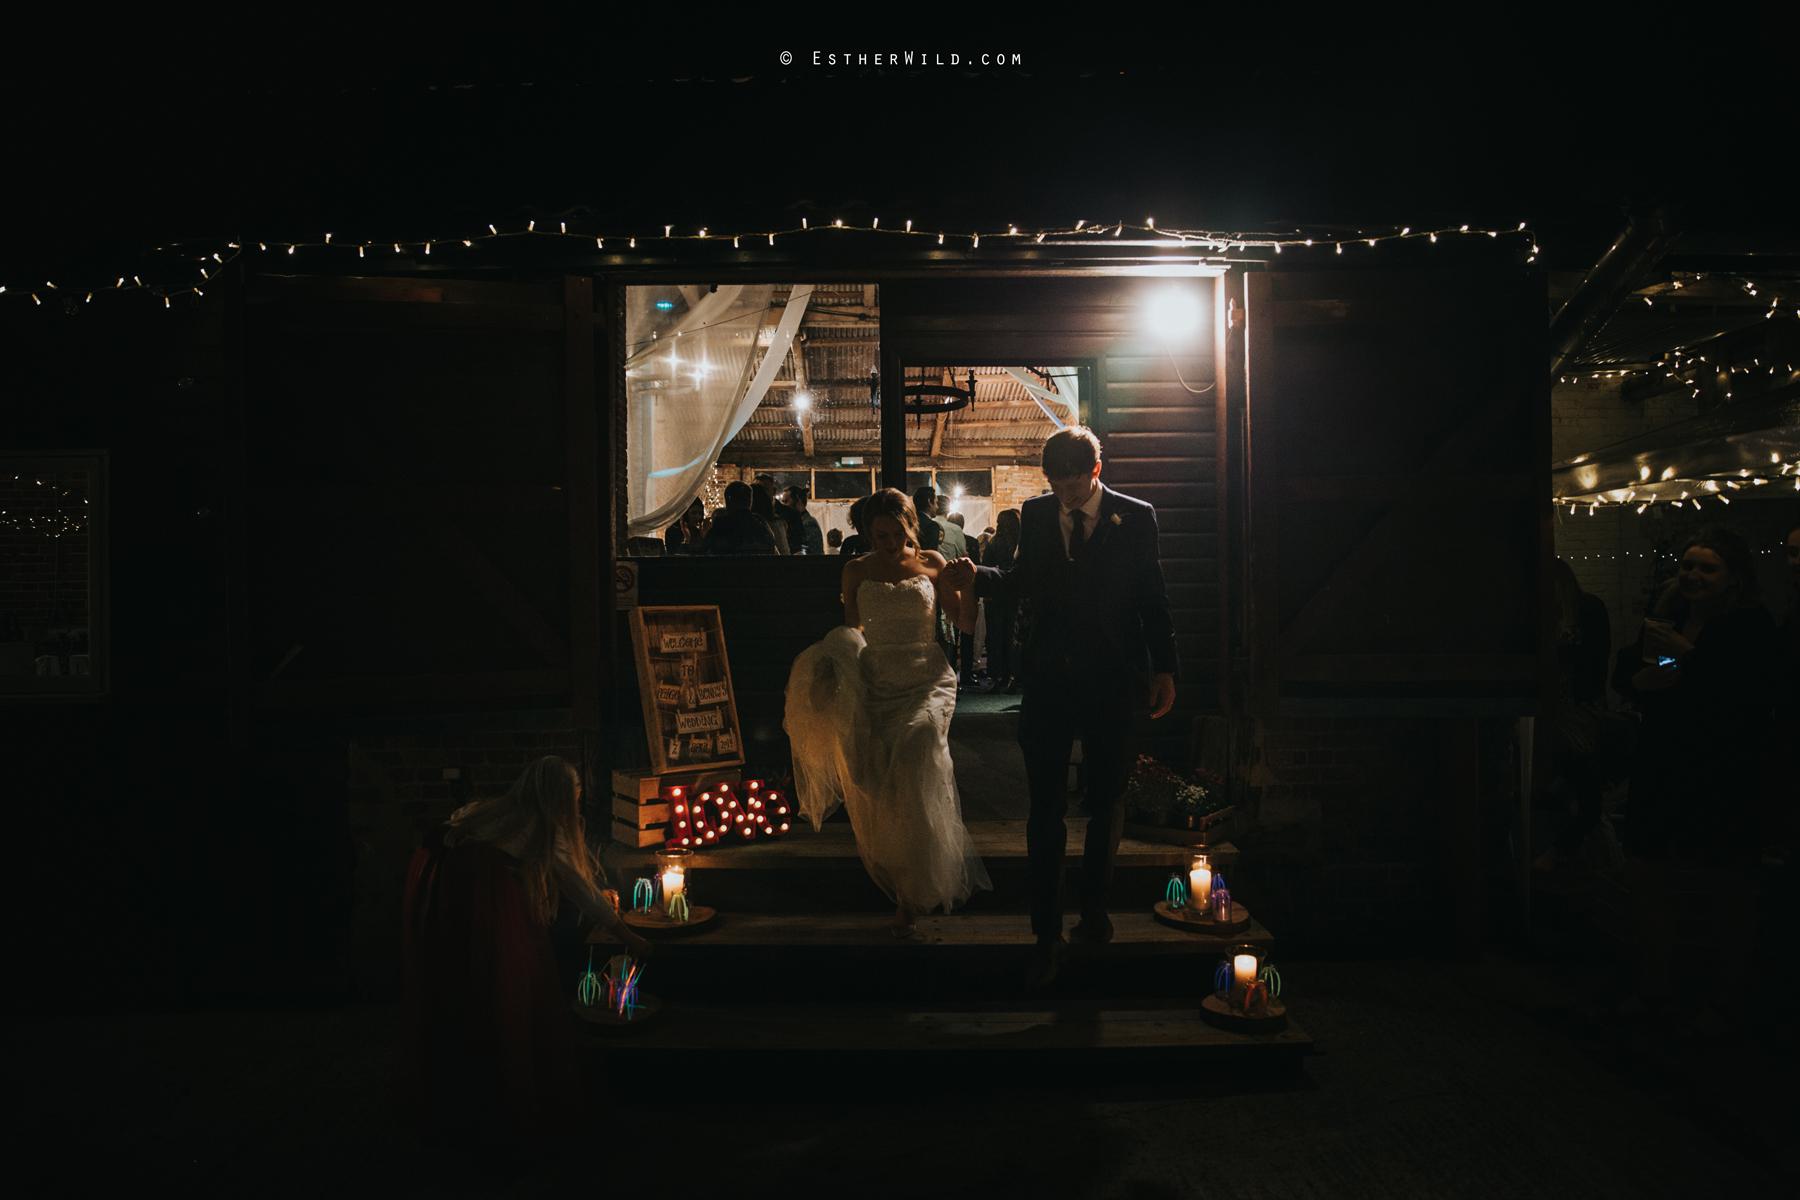 Glebe_Farm_Barn_Rustic_Norfolk_Wedding_Esther_Wild_Photographer_Copyright_IMG_3260.jpg